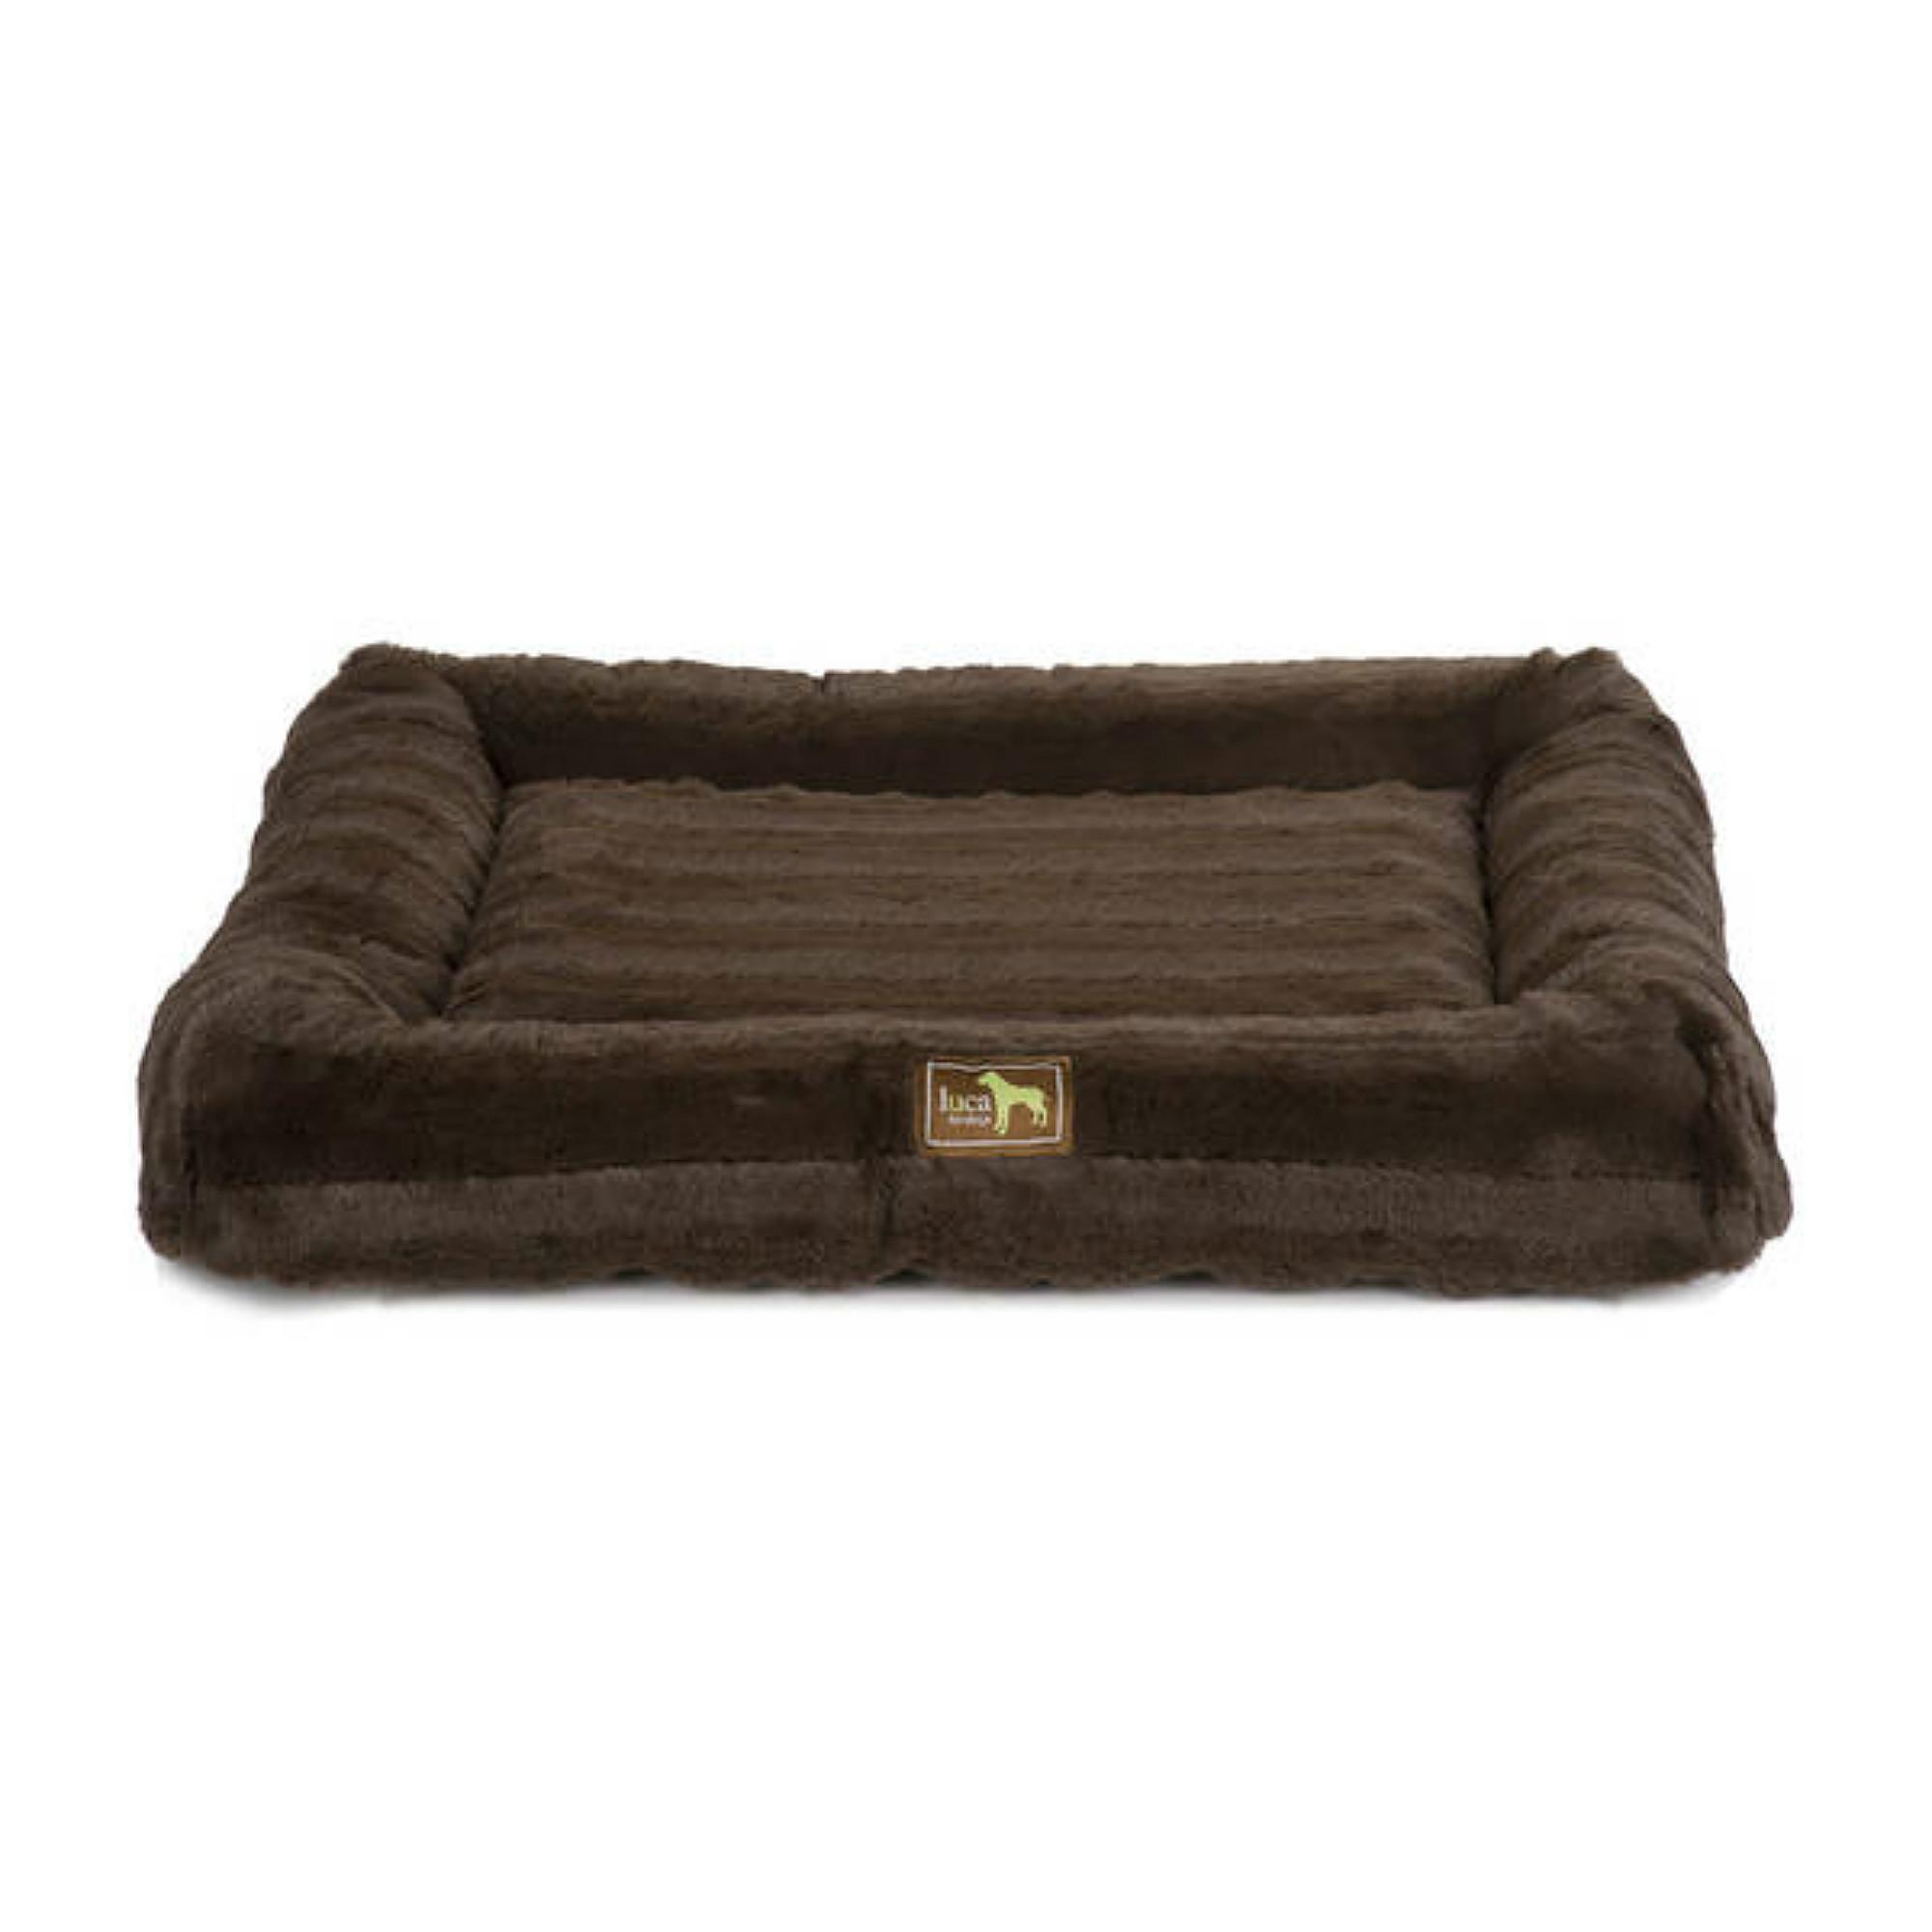 Luca Crate Cuddler Chinchilla Dog Bed - Chocolate